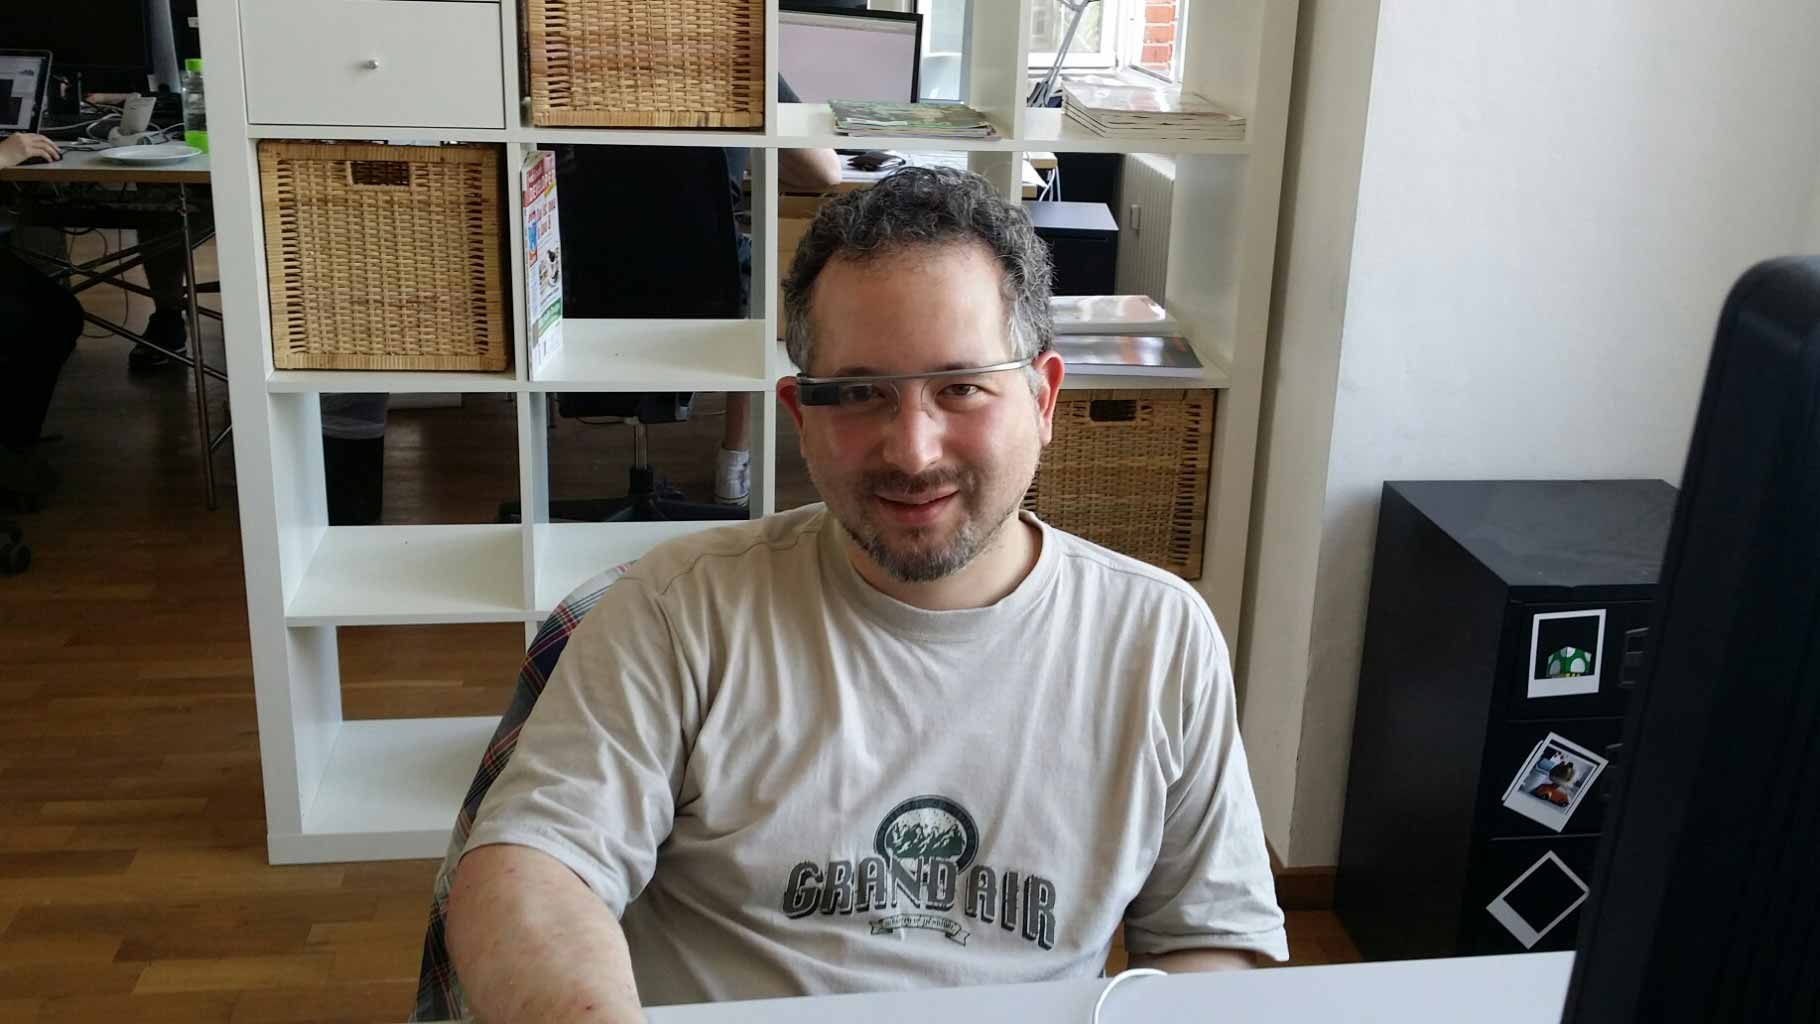 Tamio bei Aperto mit Google Glass